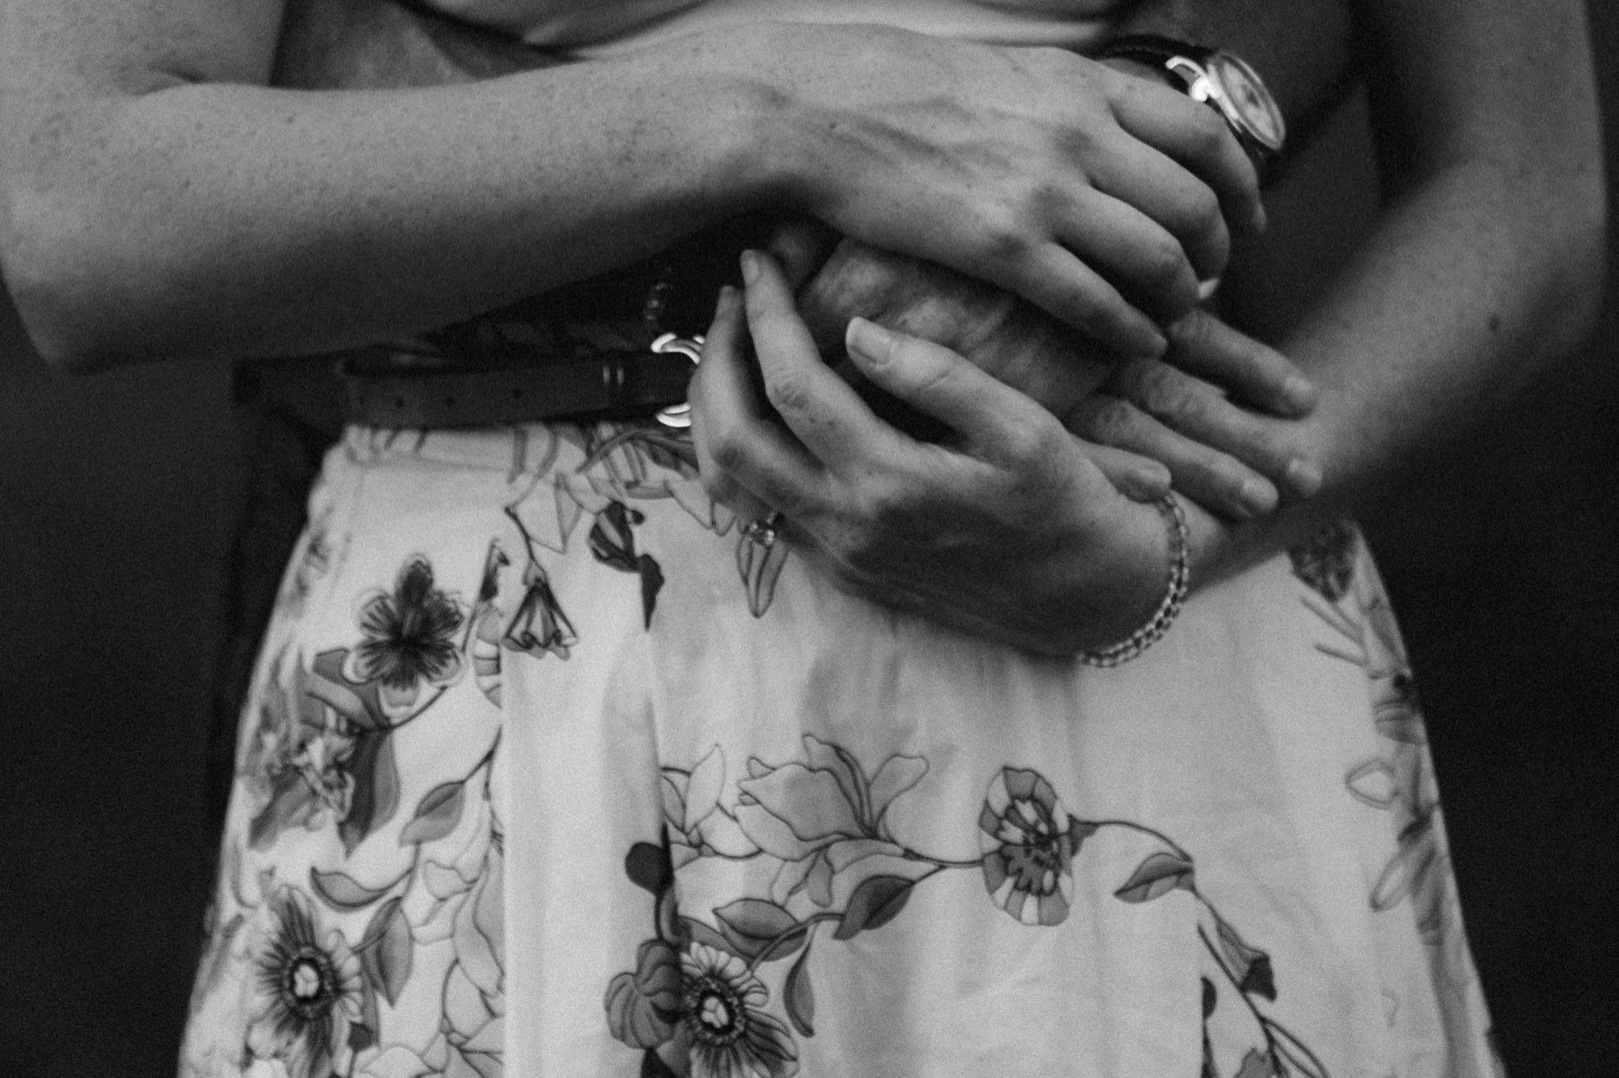 35_ENGMNT JACQ RICH-411_Events_Weddings_2018_Travel_Engagement_Photography_best_Portraits.jpg